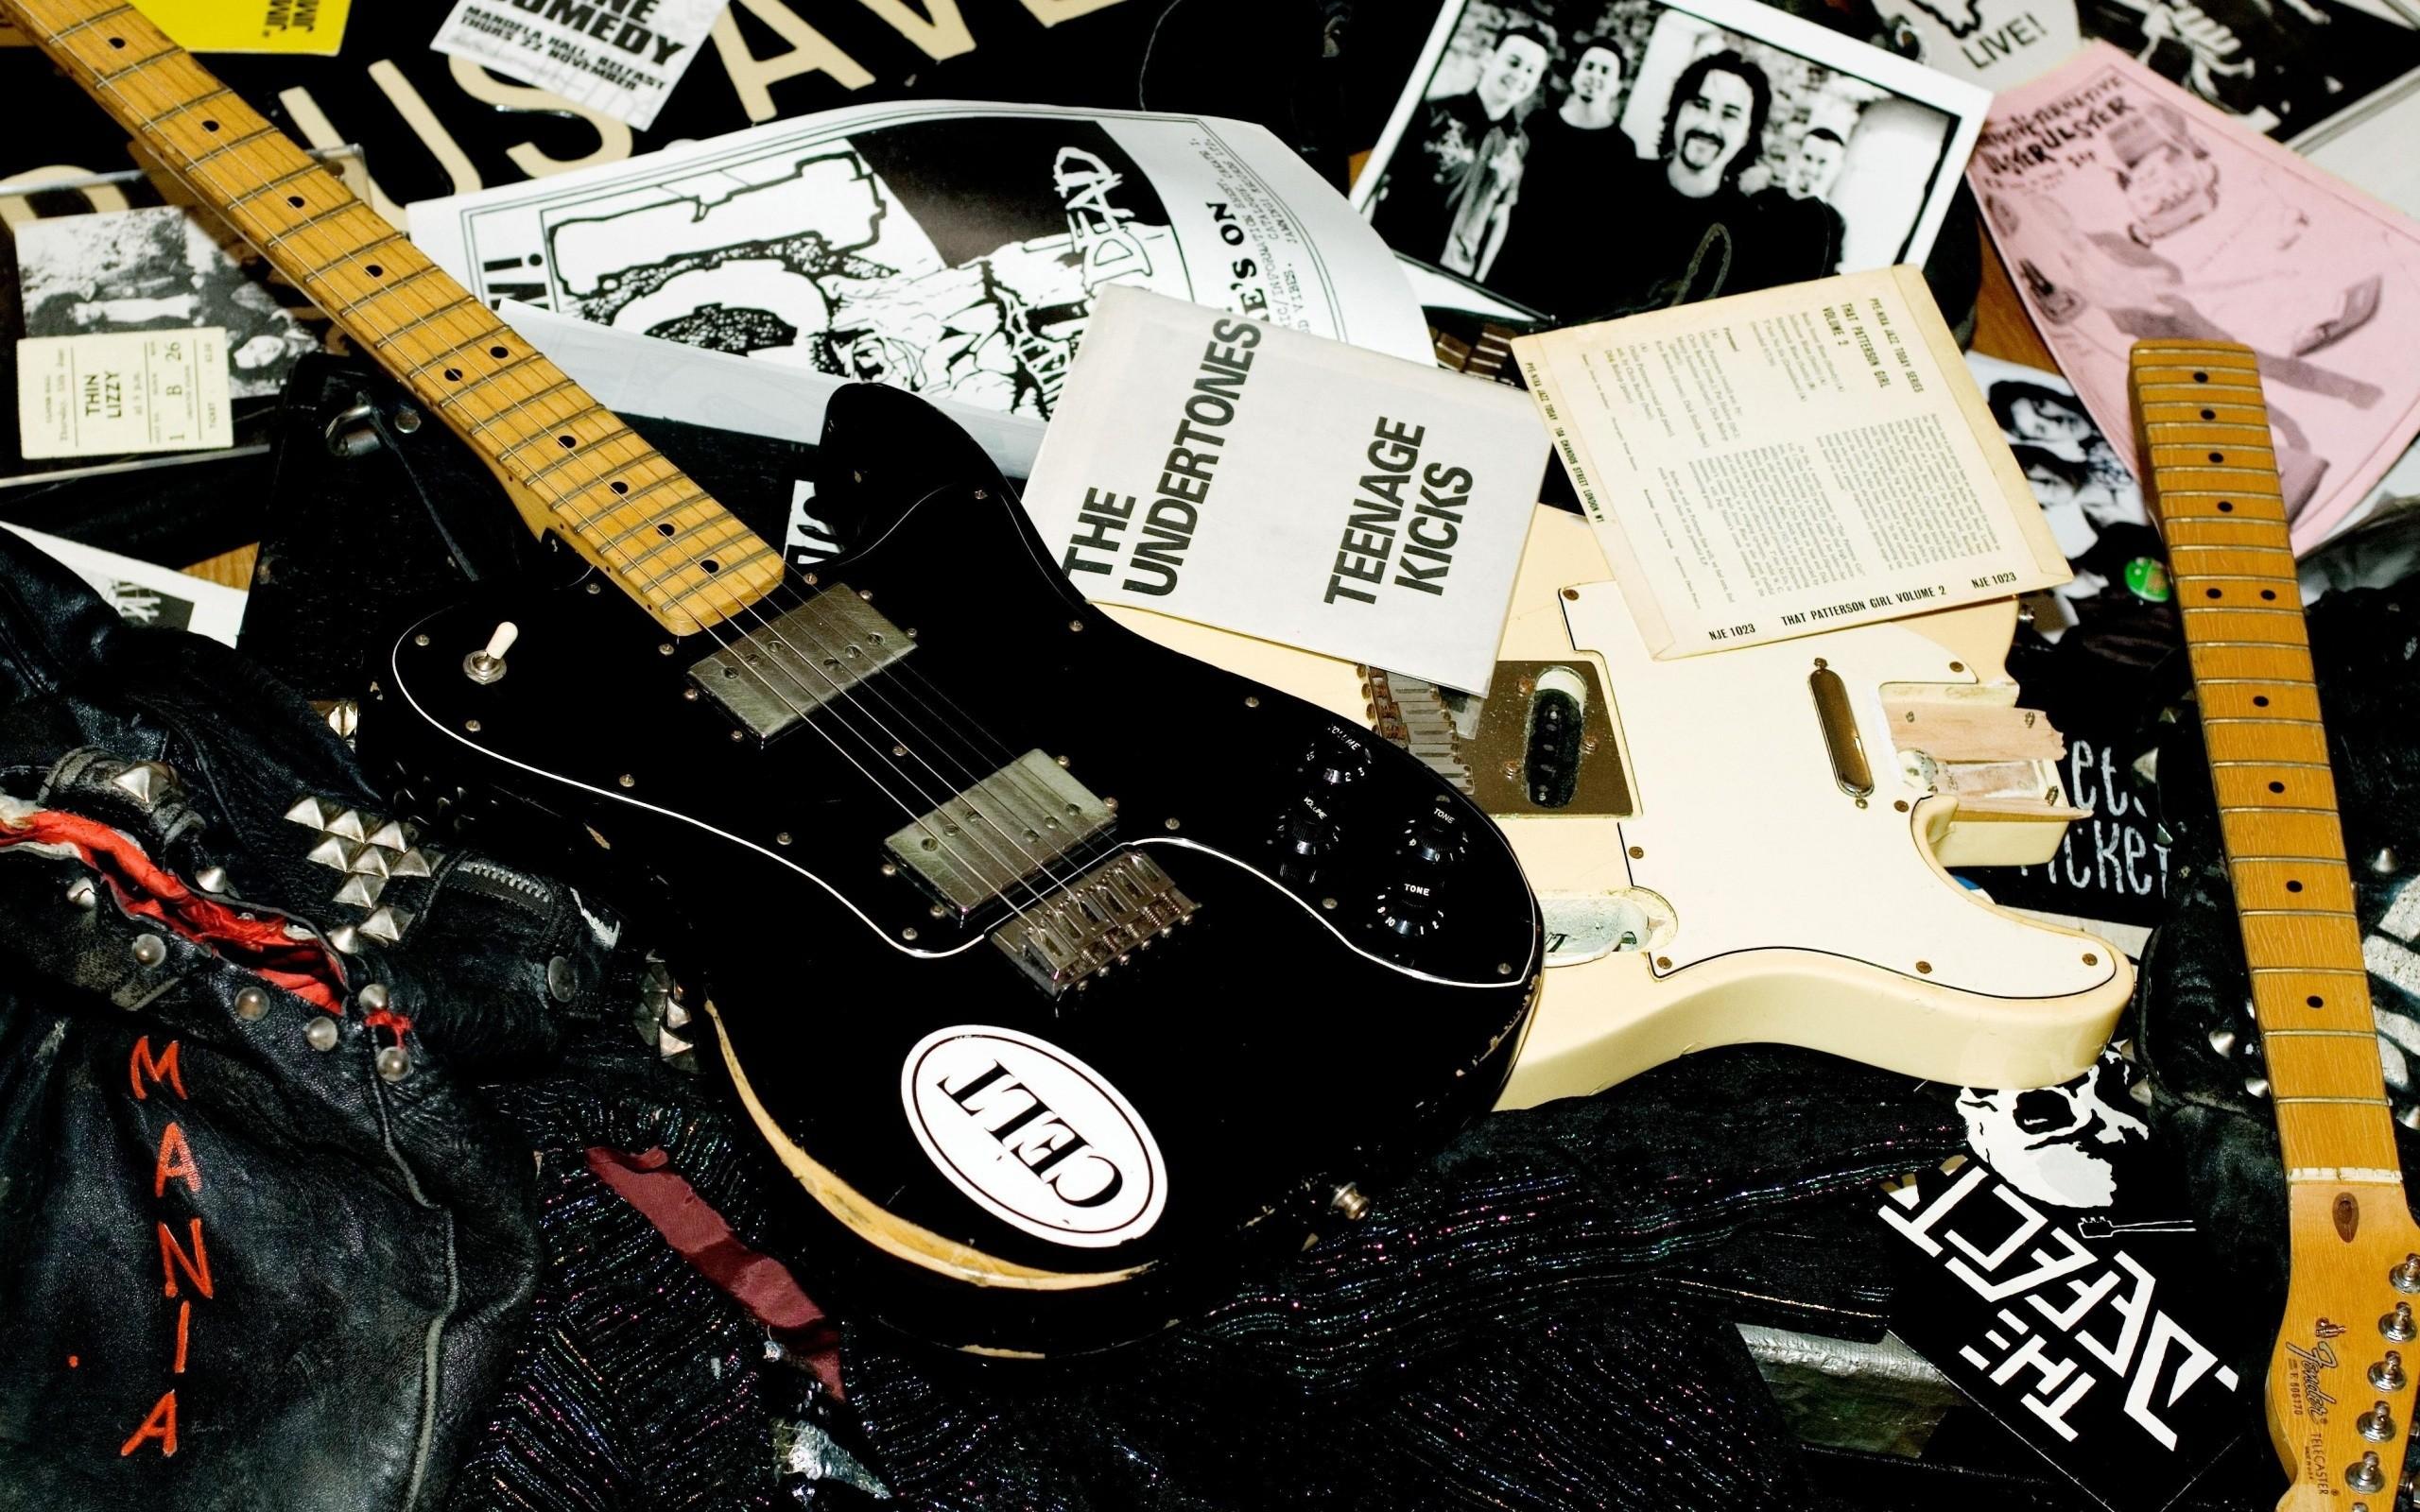 Music Rock Wallpaper 2560x1600 Music Rock Guitars Star Life 2560x1600